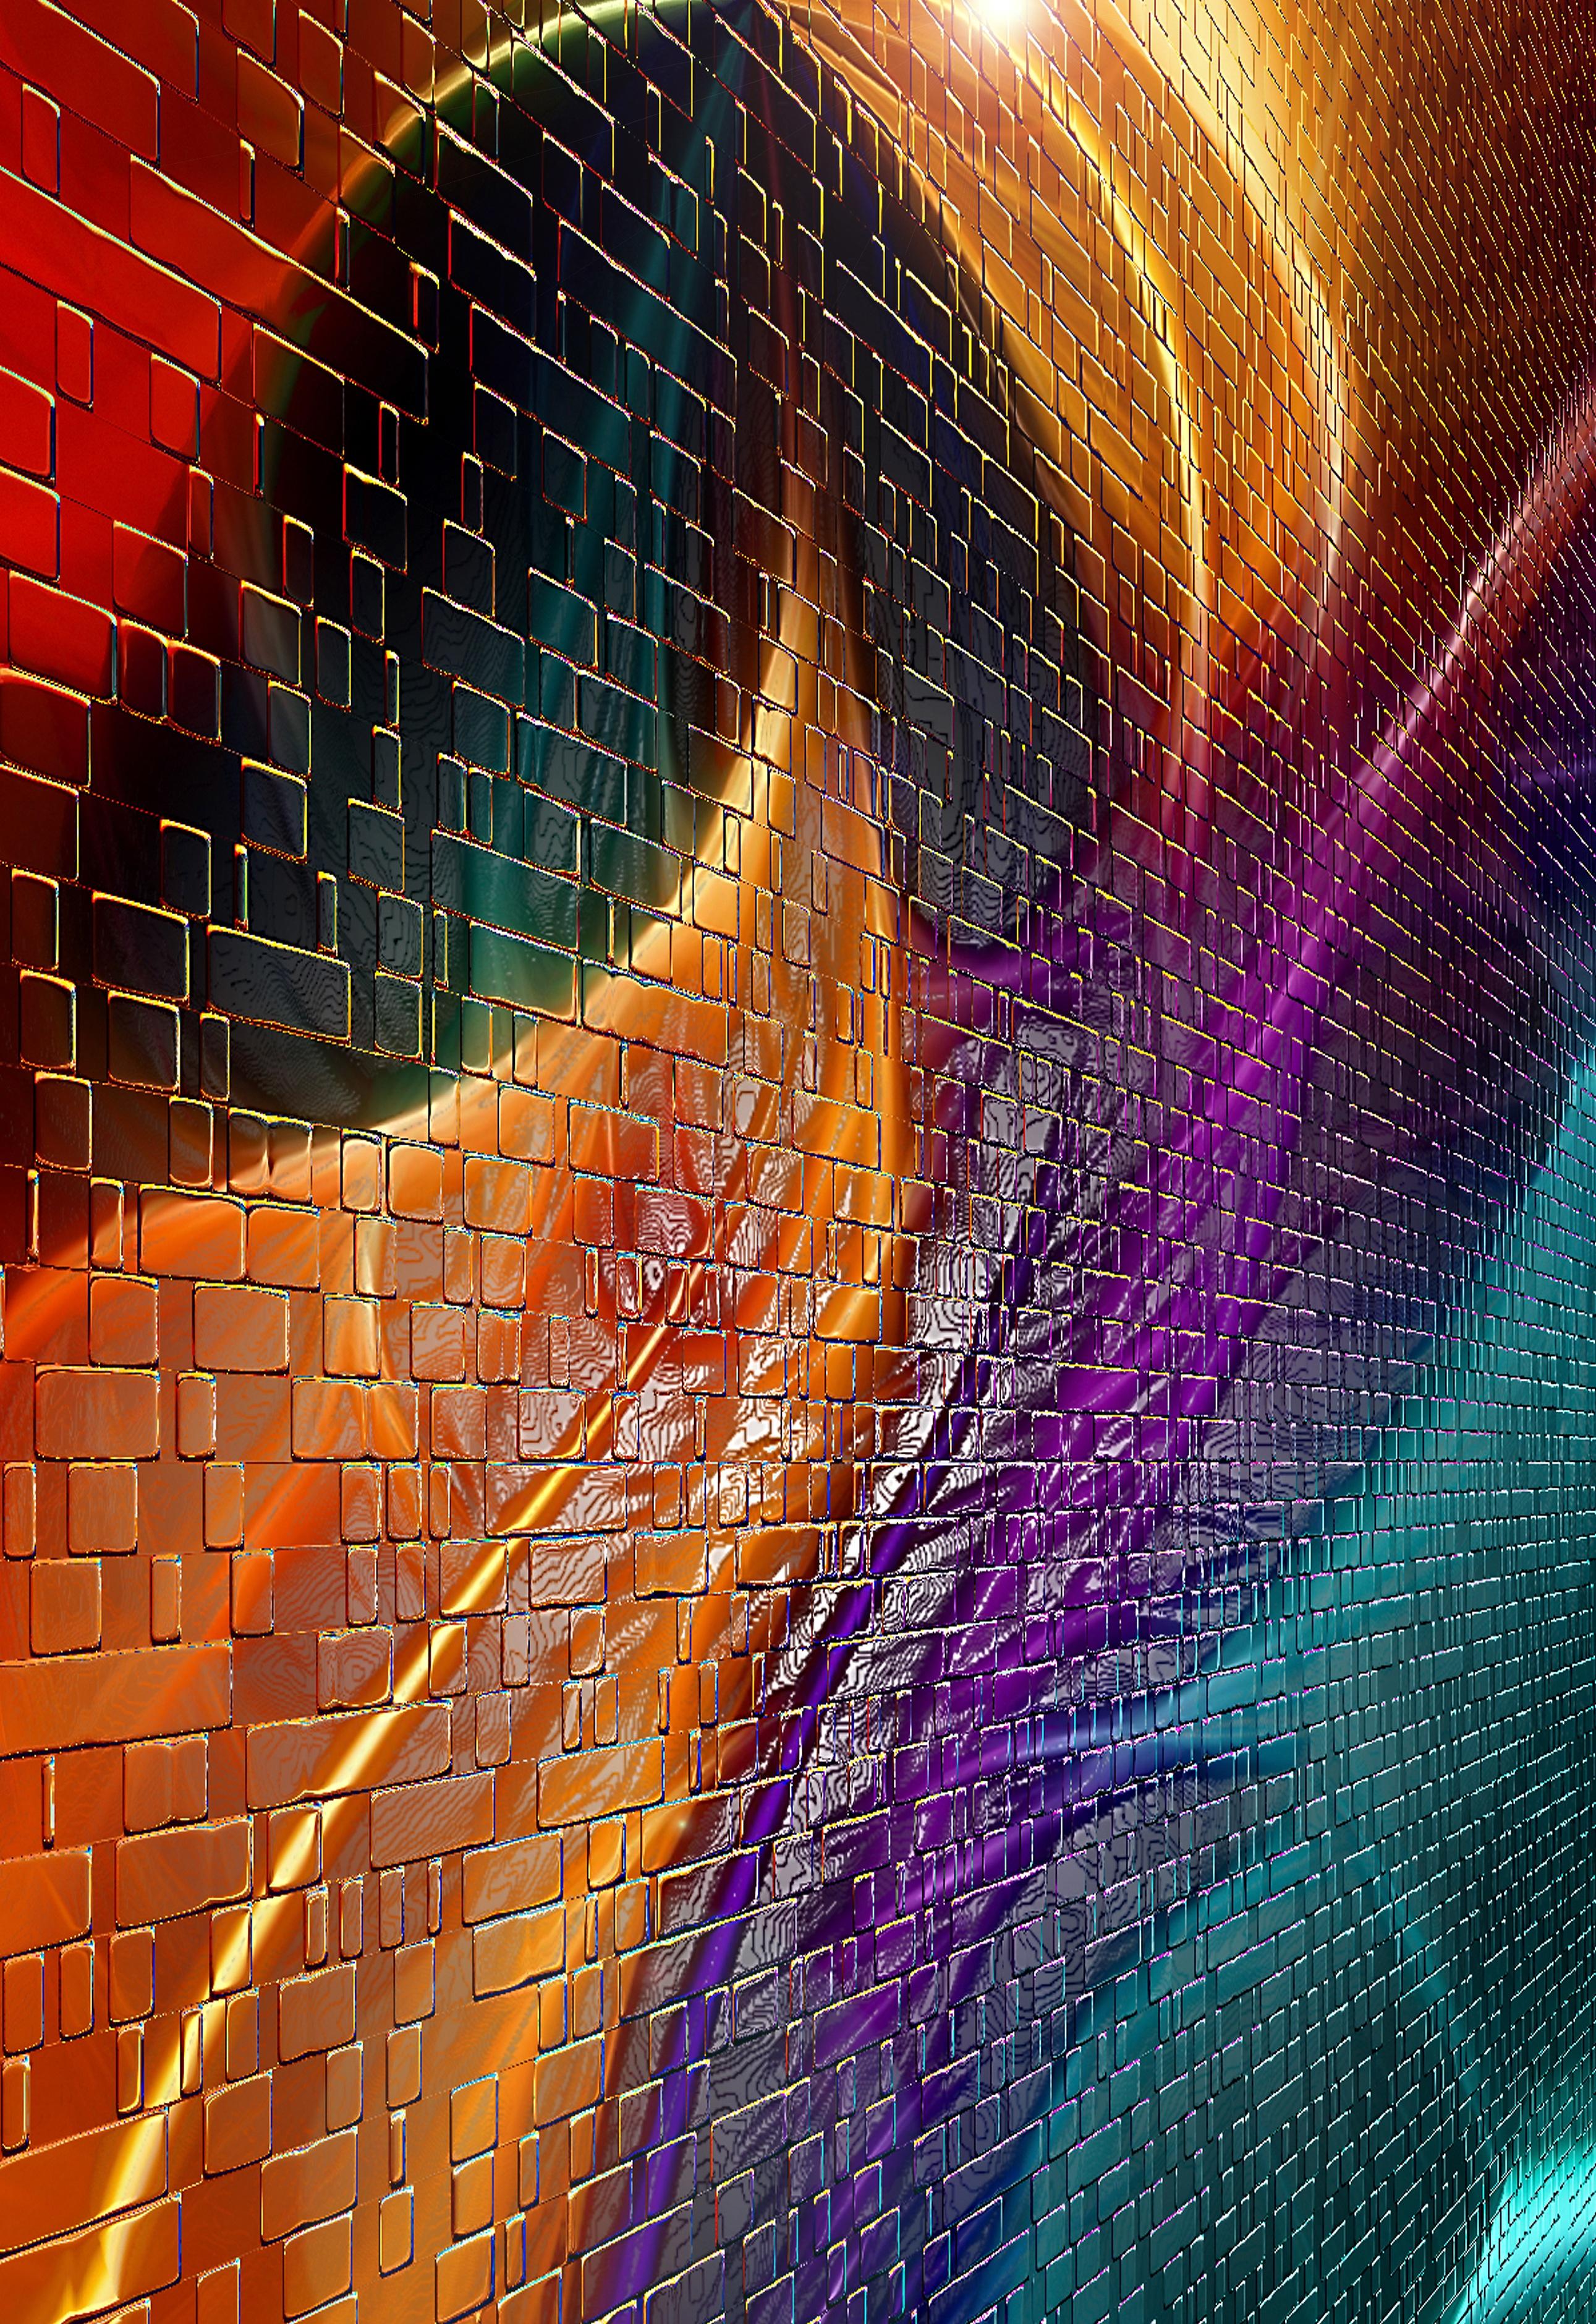 Обои Fractal, абстракция, форма, Цвет. Абстракции foto 18